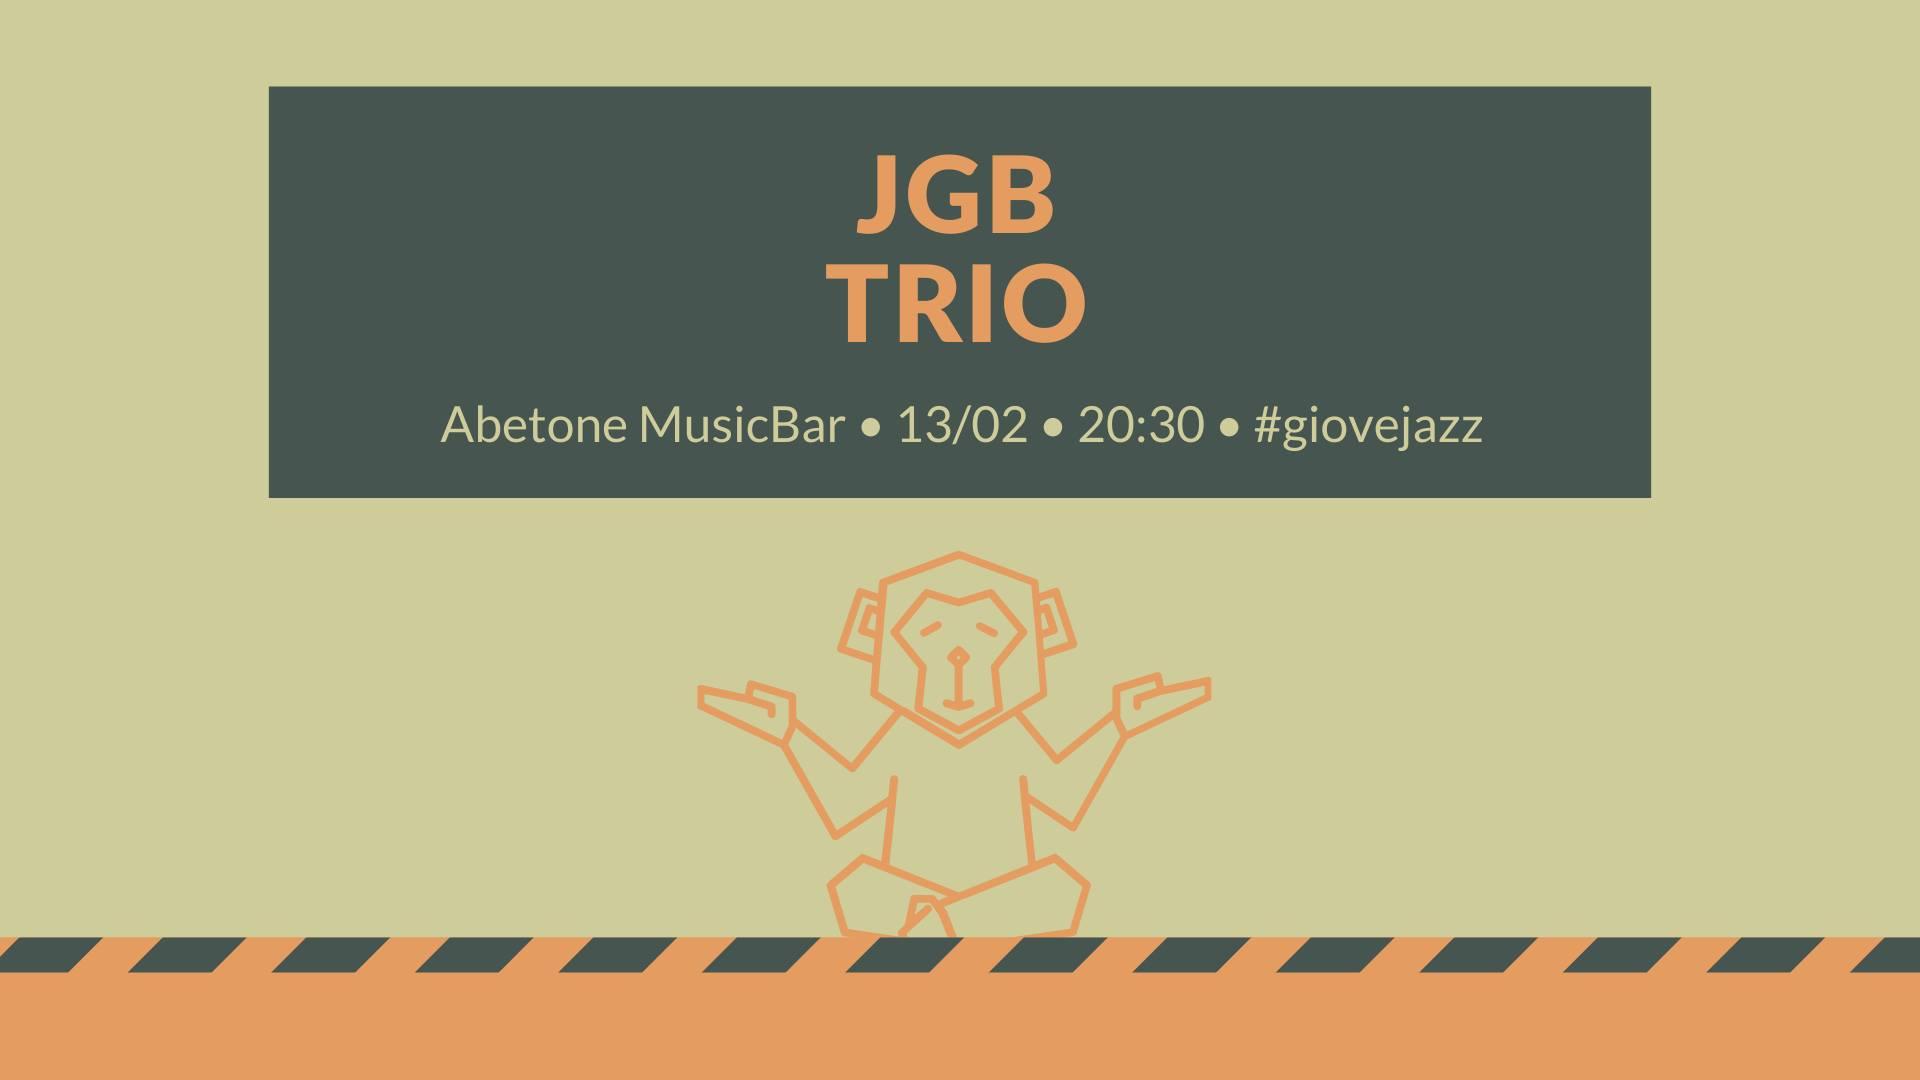 Giovejazz - JGB Trio - Abetone Music Bar - Sassari - 13 febbraio 2020 - eventi - 2020 - Sa Scena Sarda